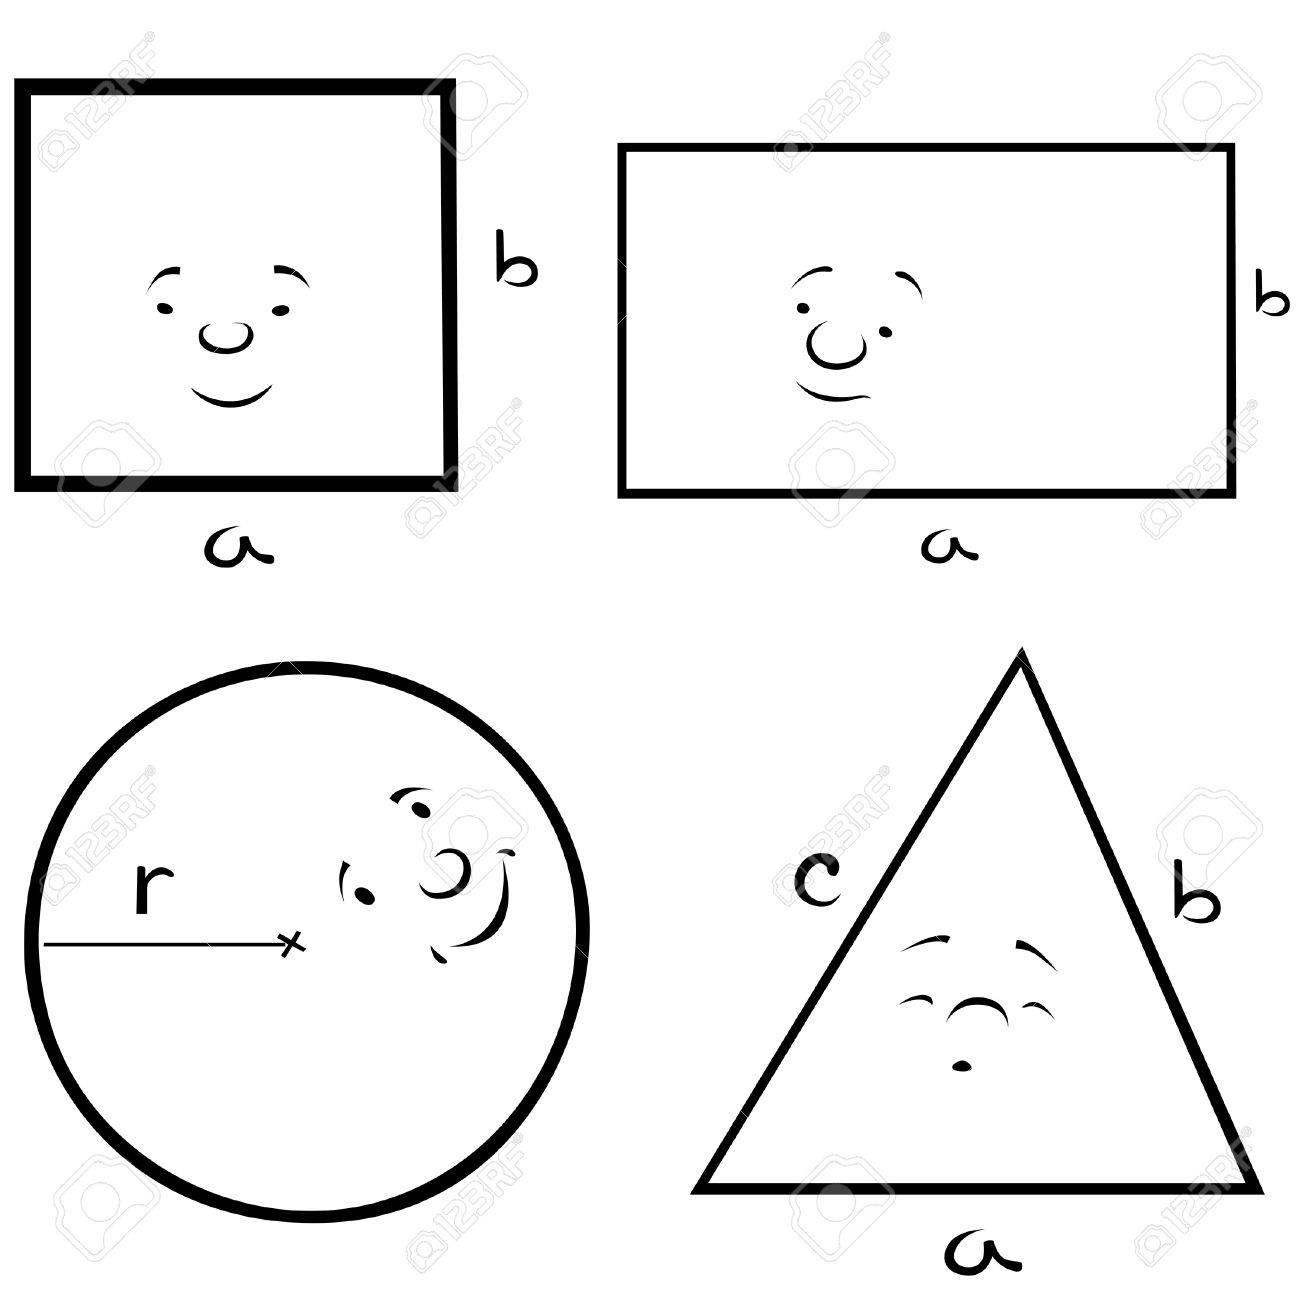 Geometric Shapes - Black and White Cartoon illustration, Vector Stock Vector - 8756225